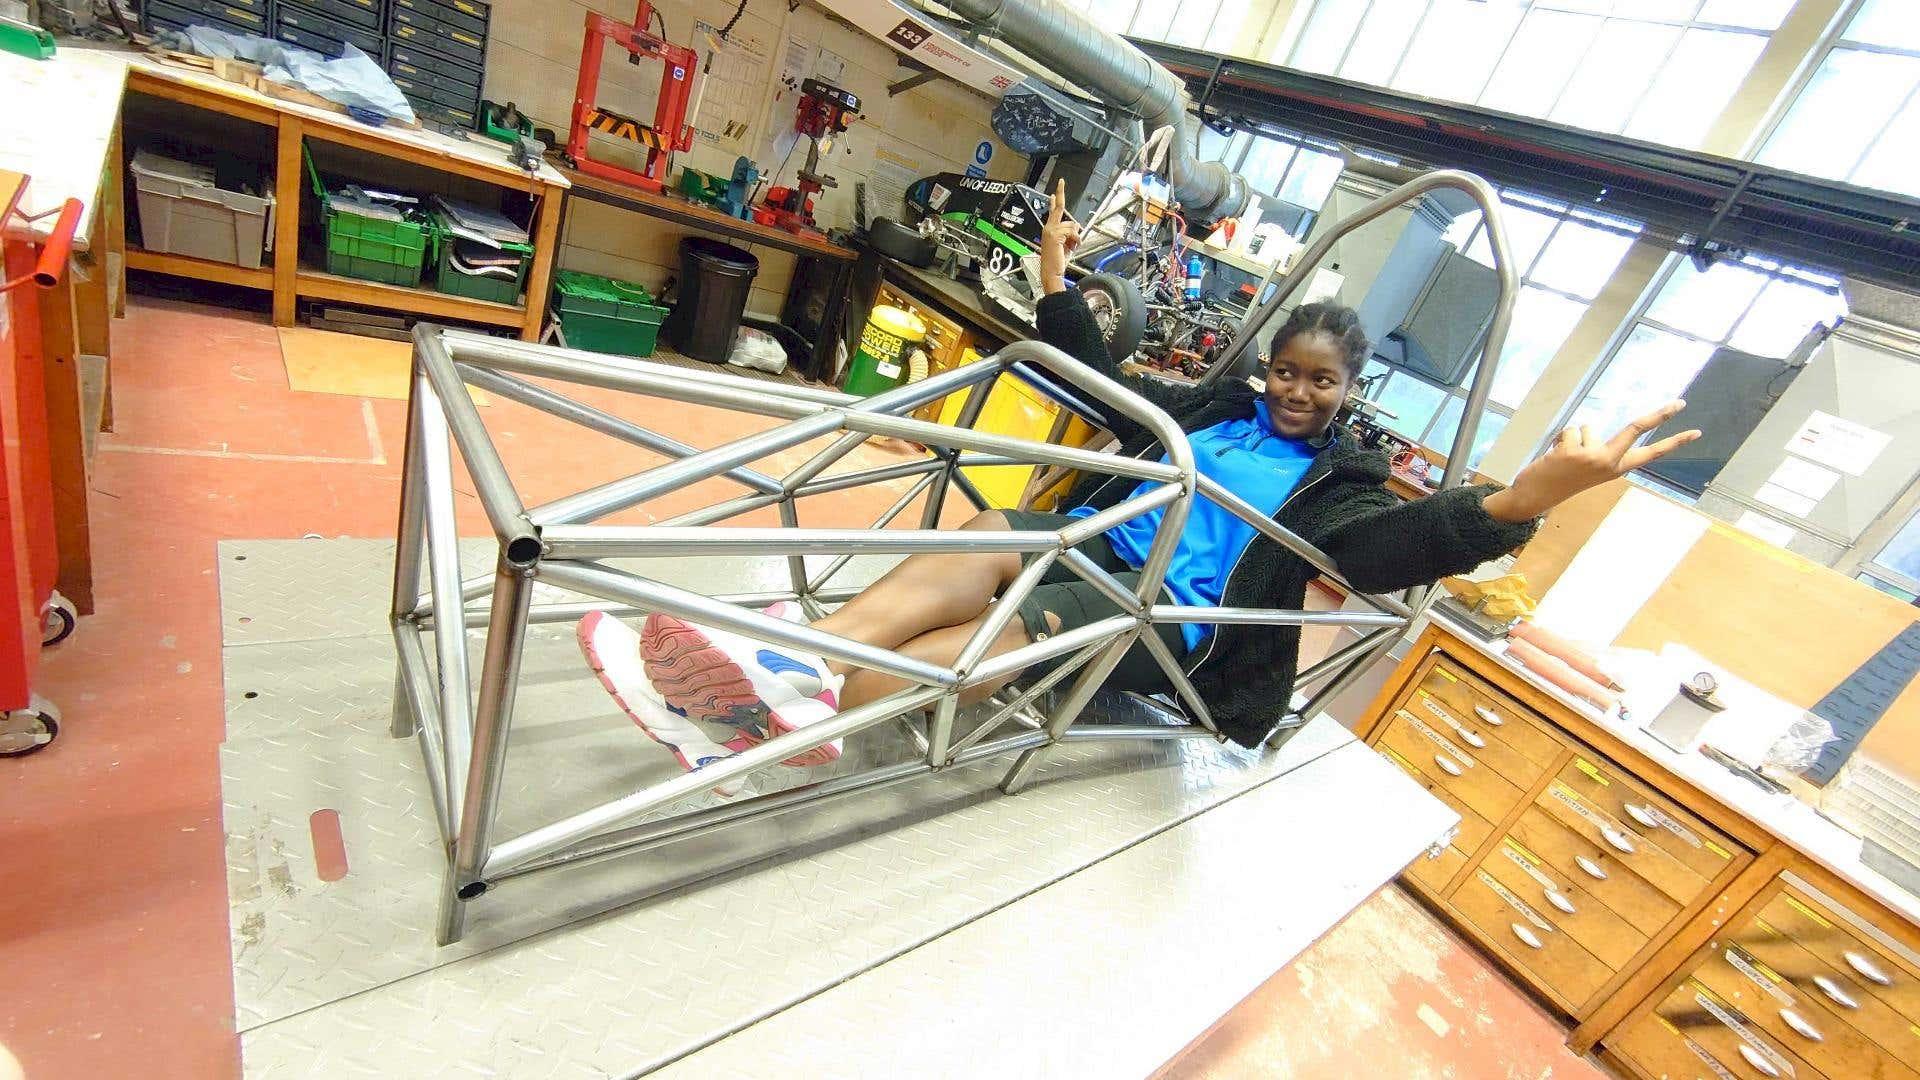 Gryphon chassis metals4U steel tube